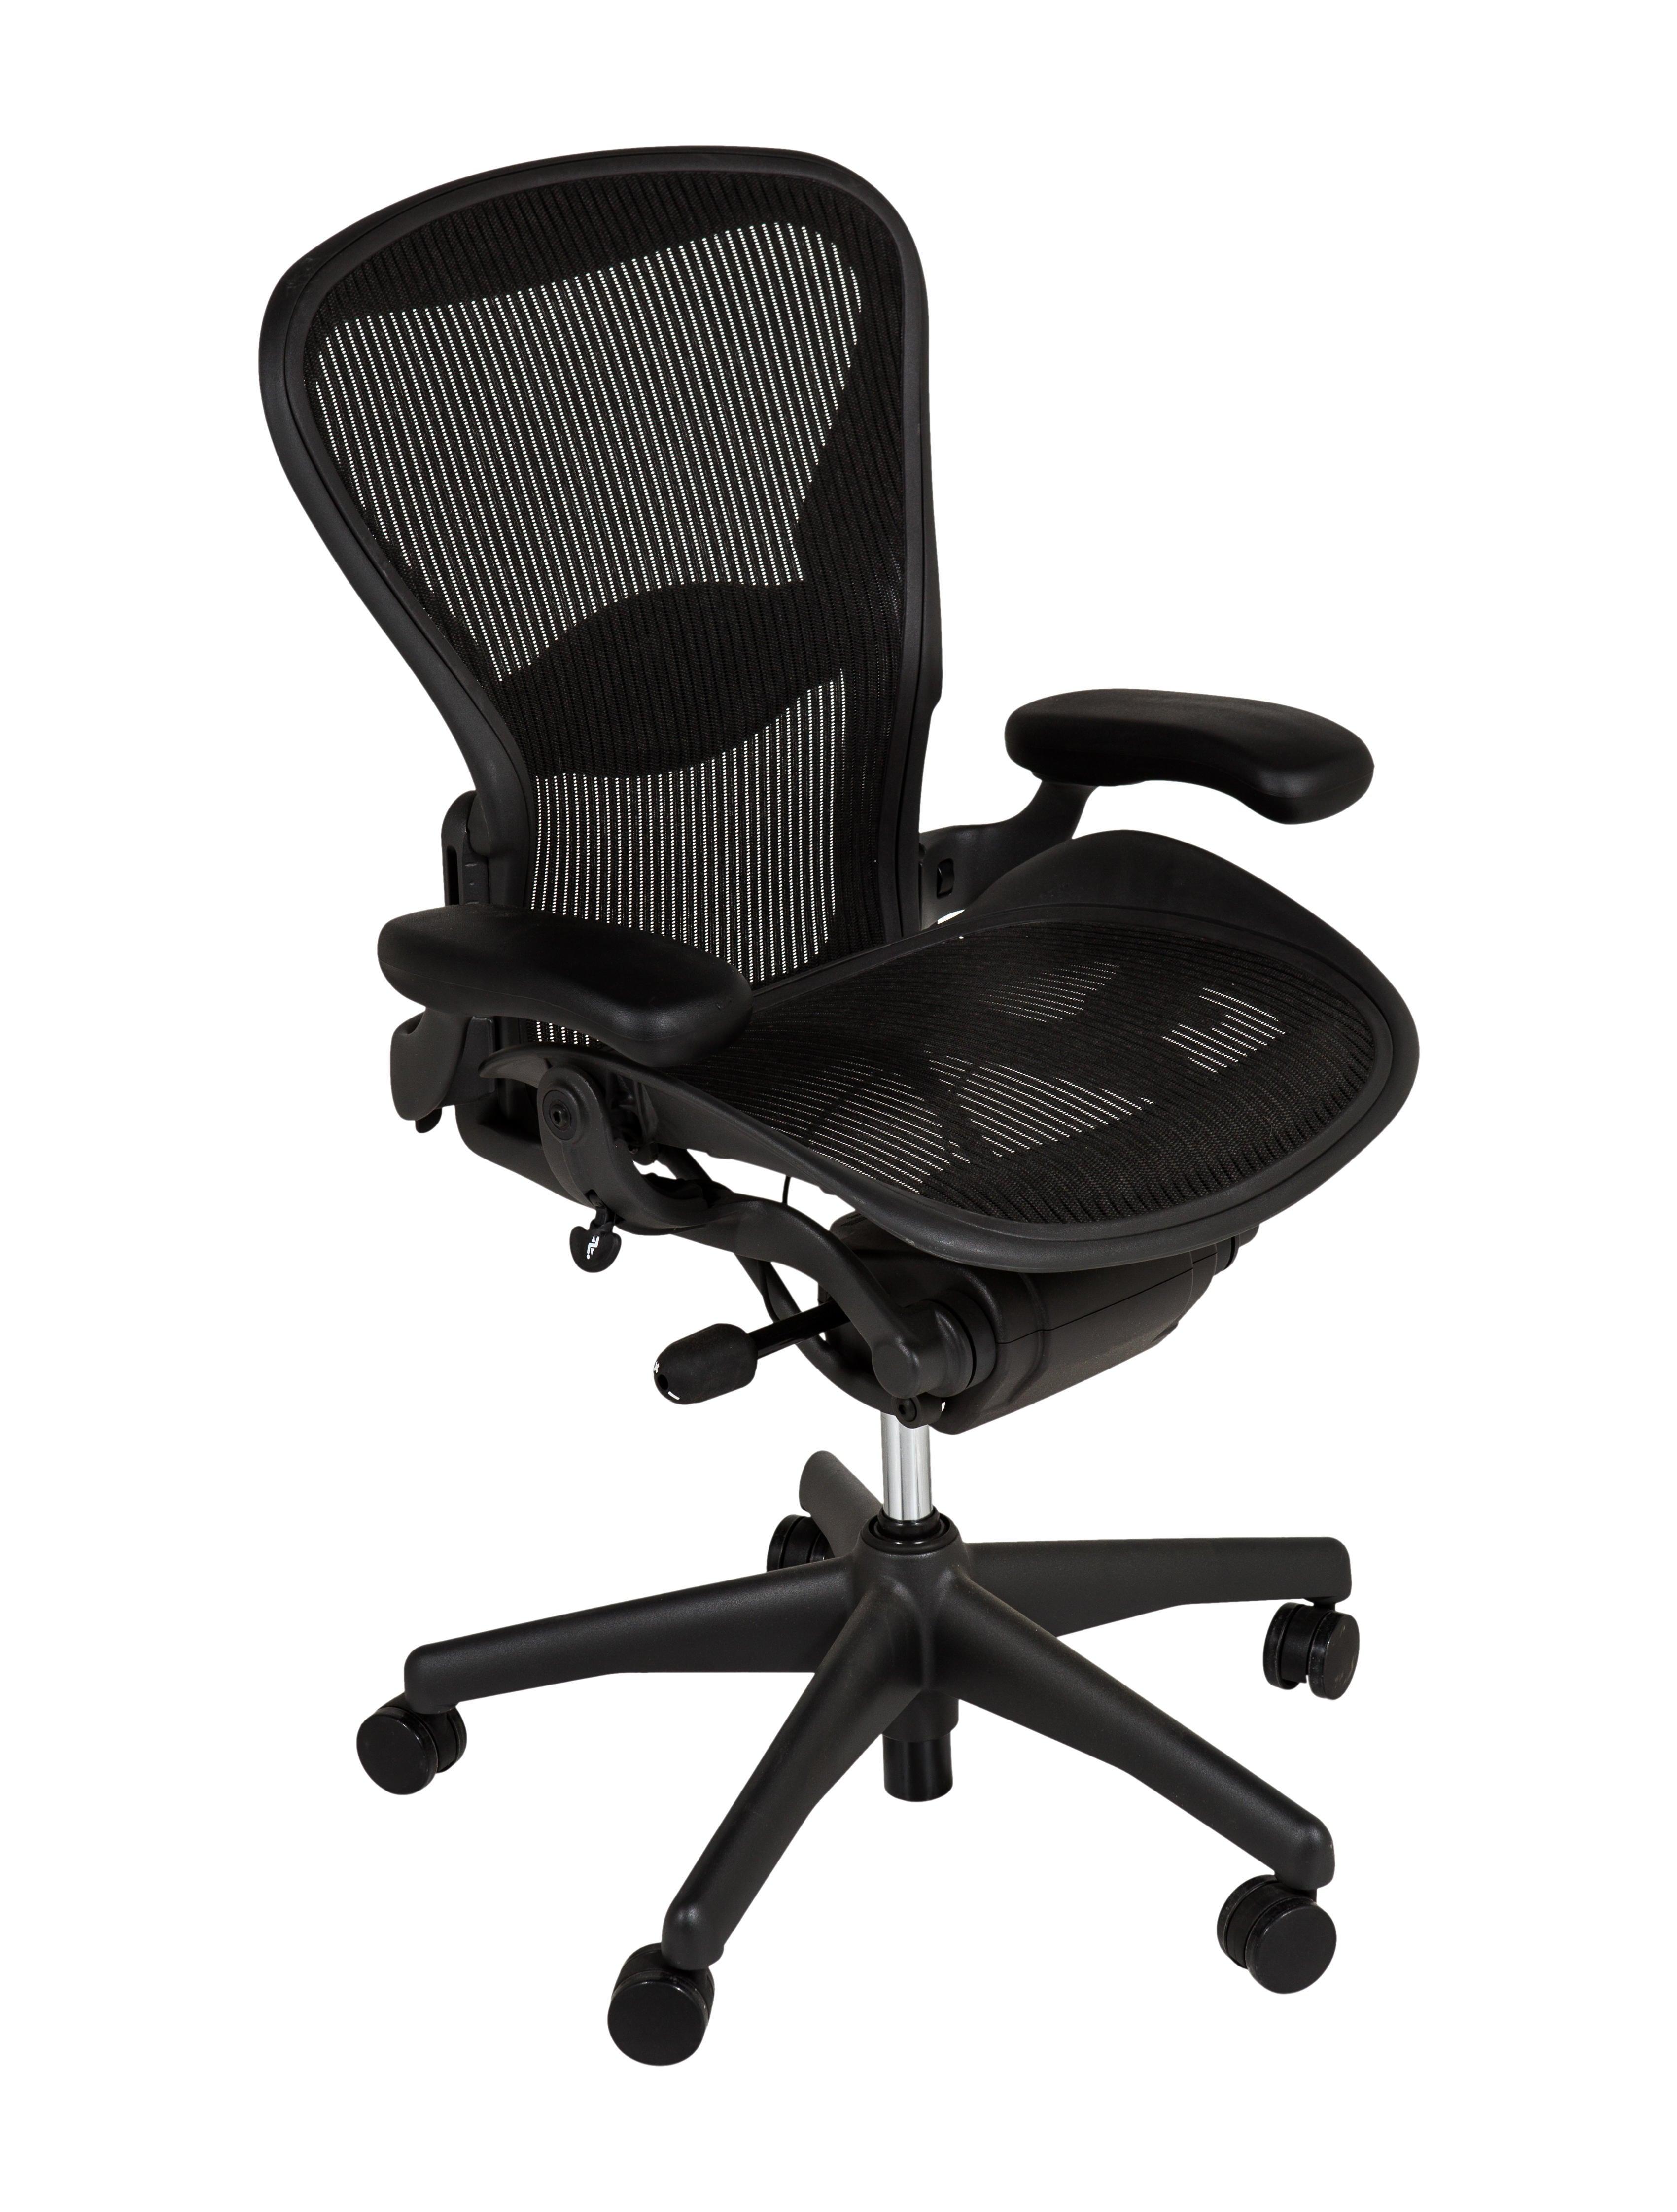 Elizahittmancom Aeron Desk Chairs Office Chair